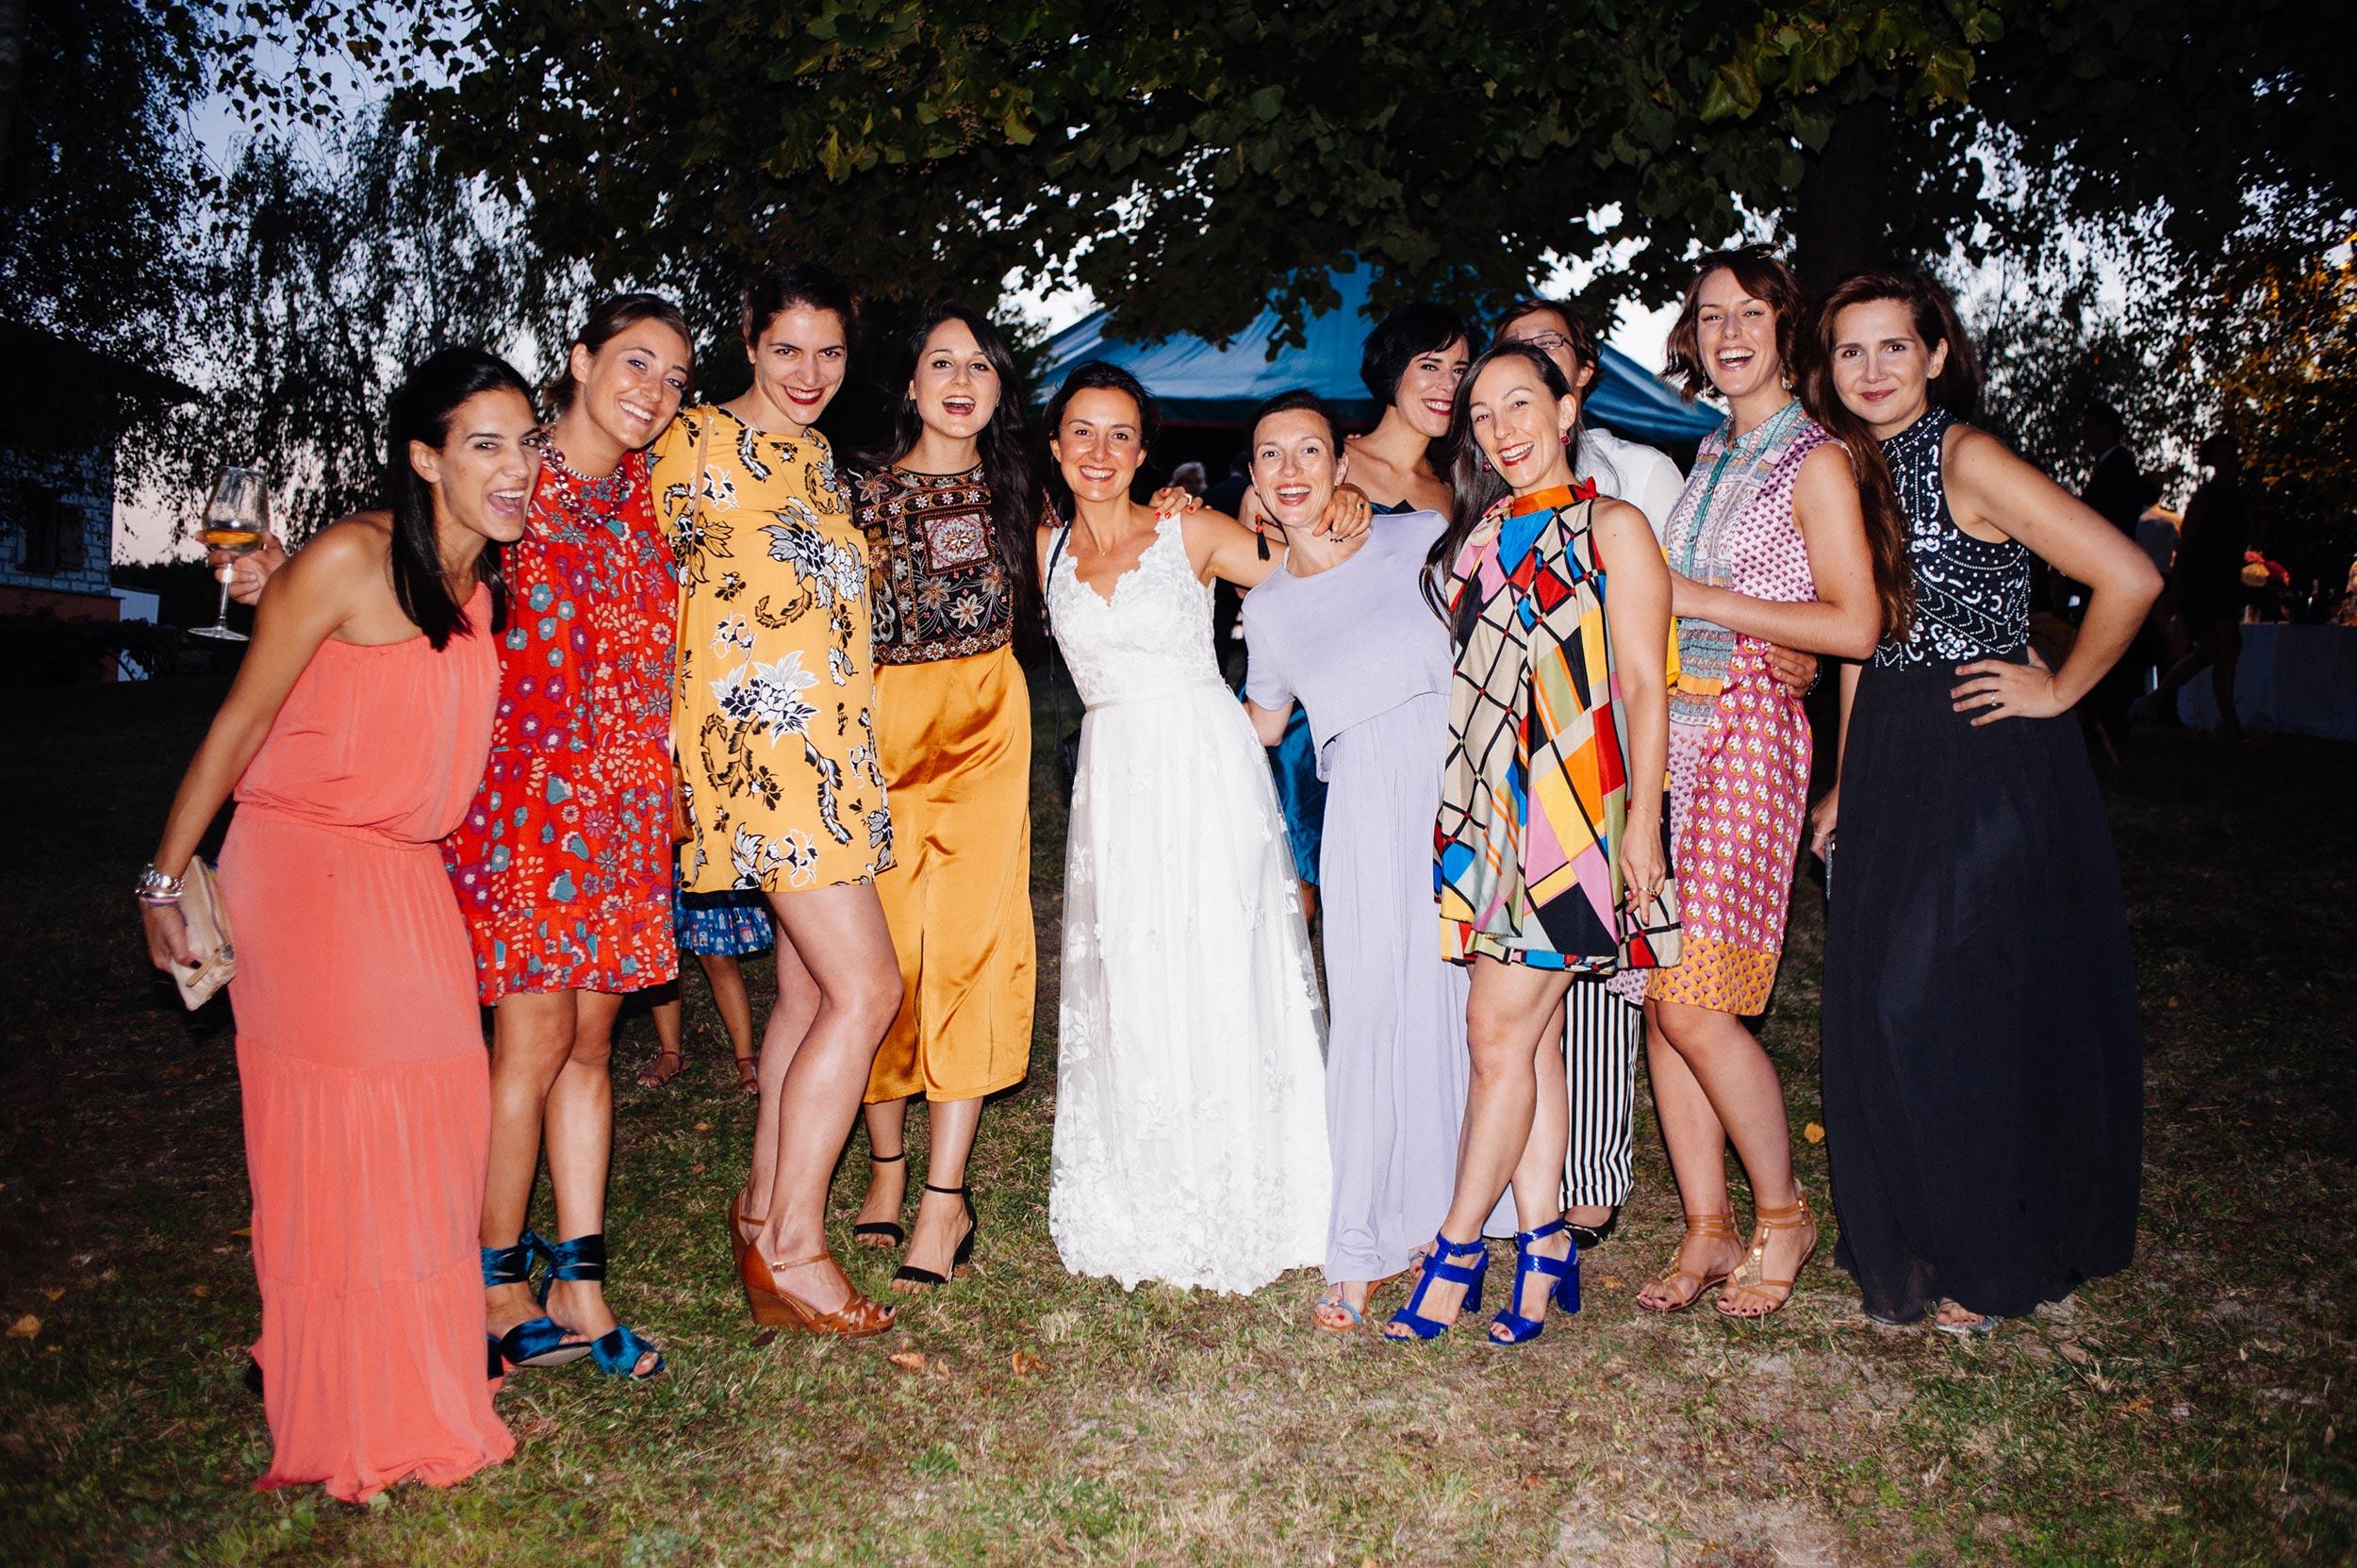 2016-Davor-Chiara-Monferrato-Asti-Vercelli-Wedding-Photographer-Italy-Alessandro-Avenali-64.jpg